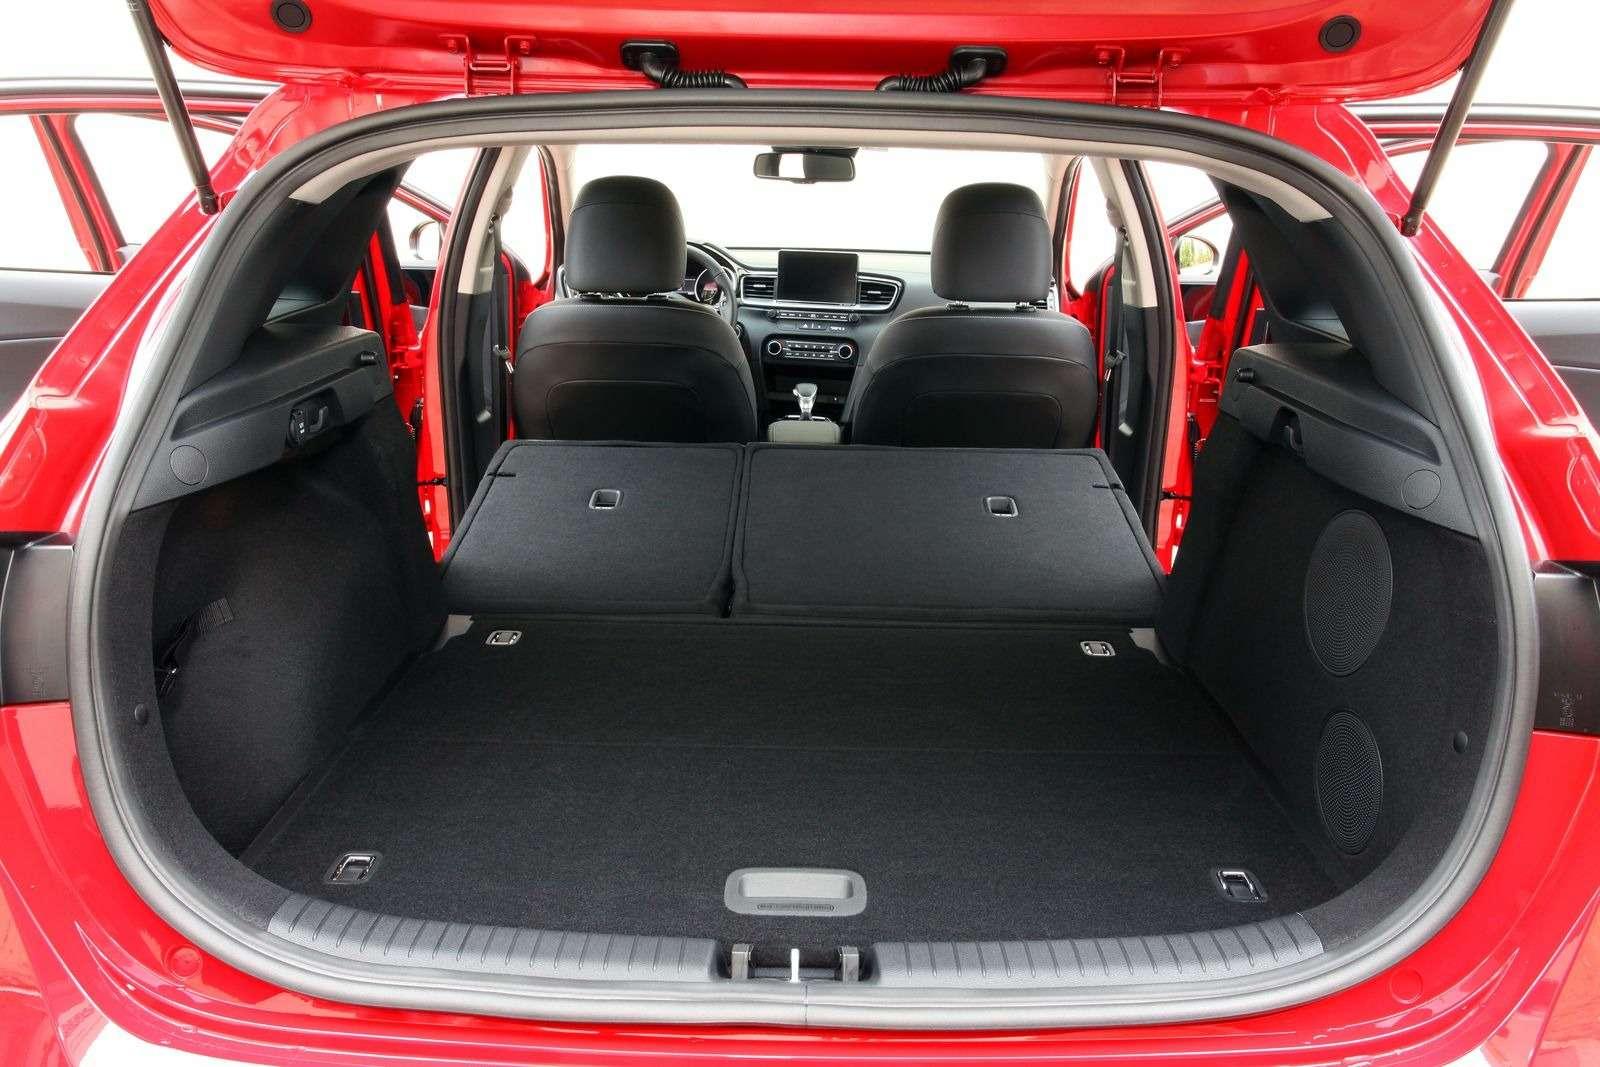 Новый Kia Ceed: началось производство вРоссии. Цен пока нет— фото 887511